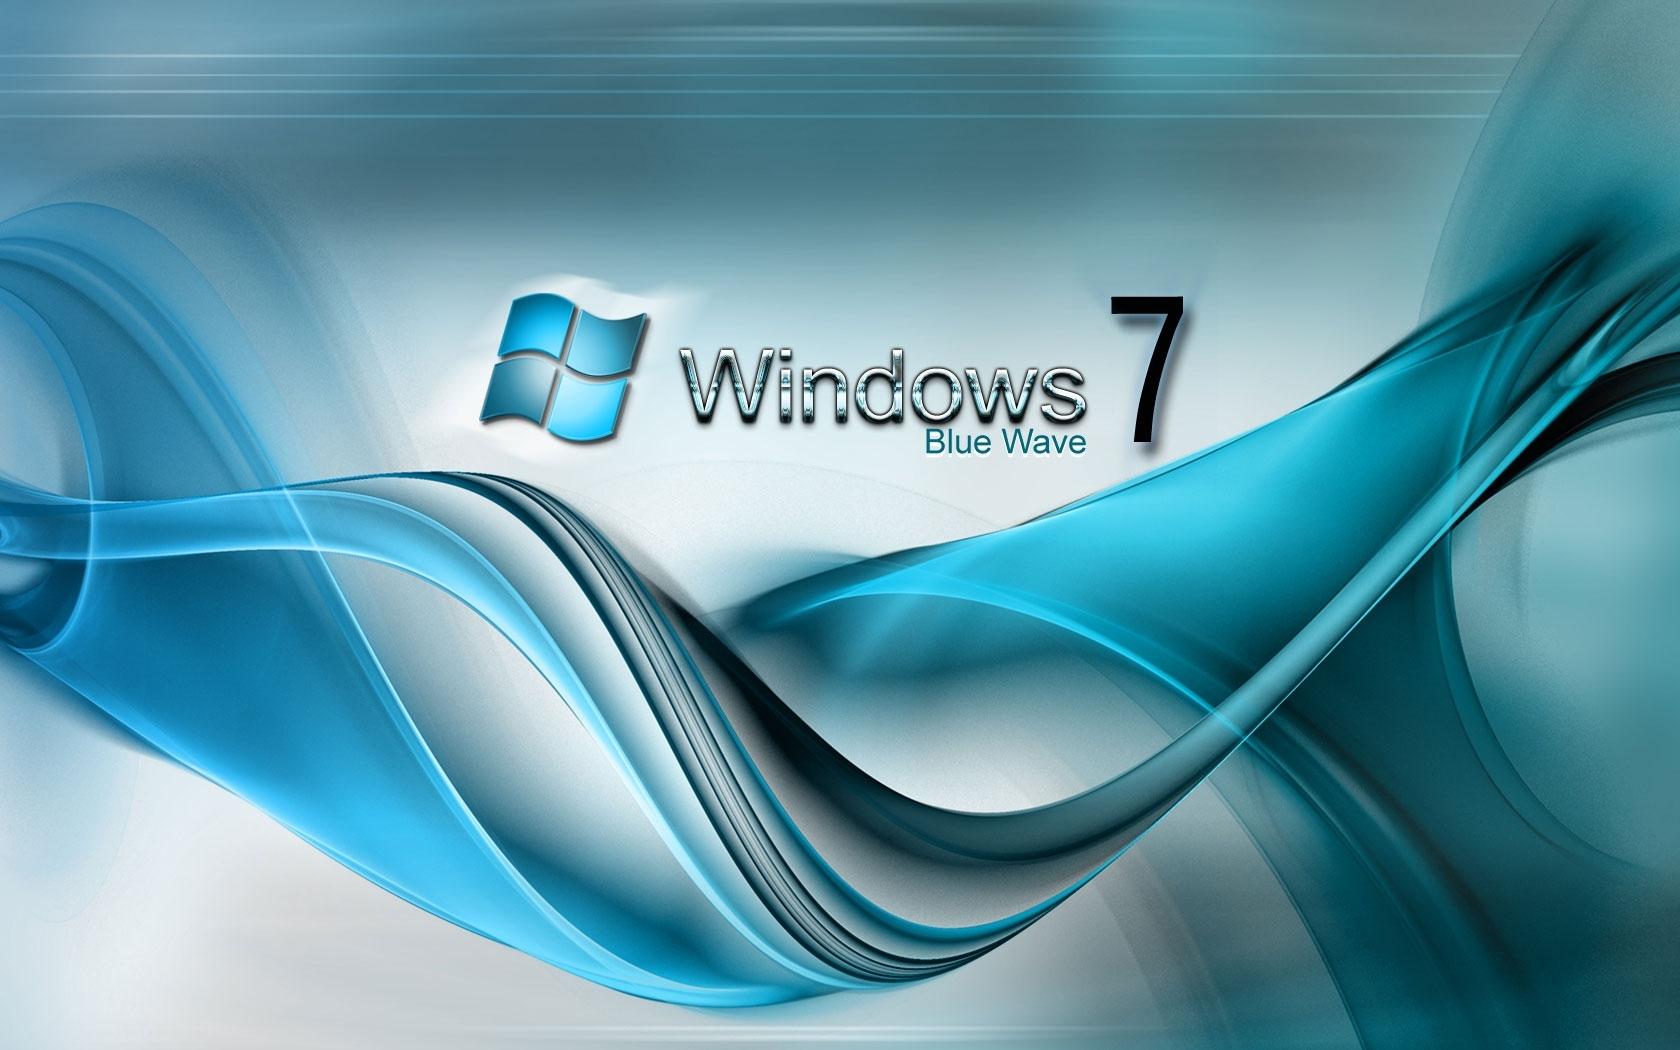 10 best free wallpaper for laptop windows 7 full hd 1920×1080 for pc